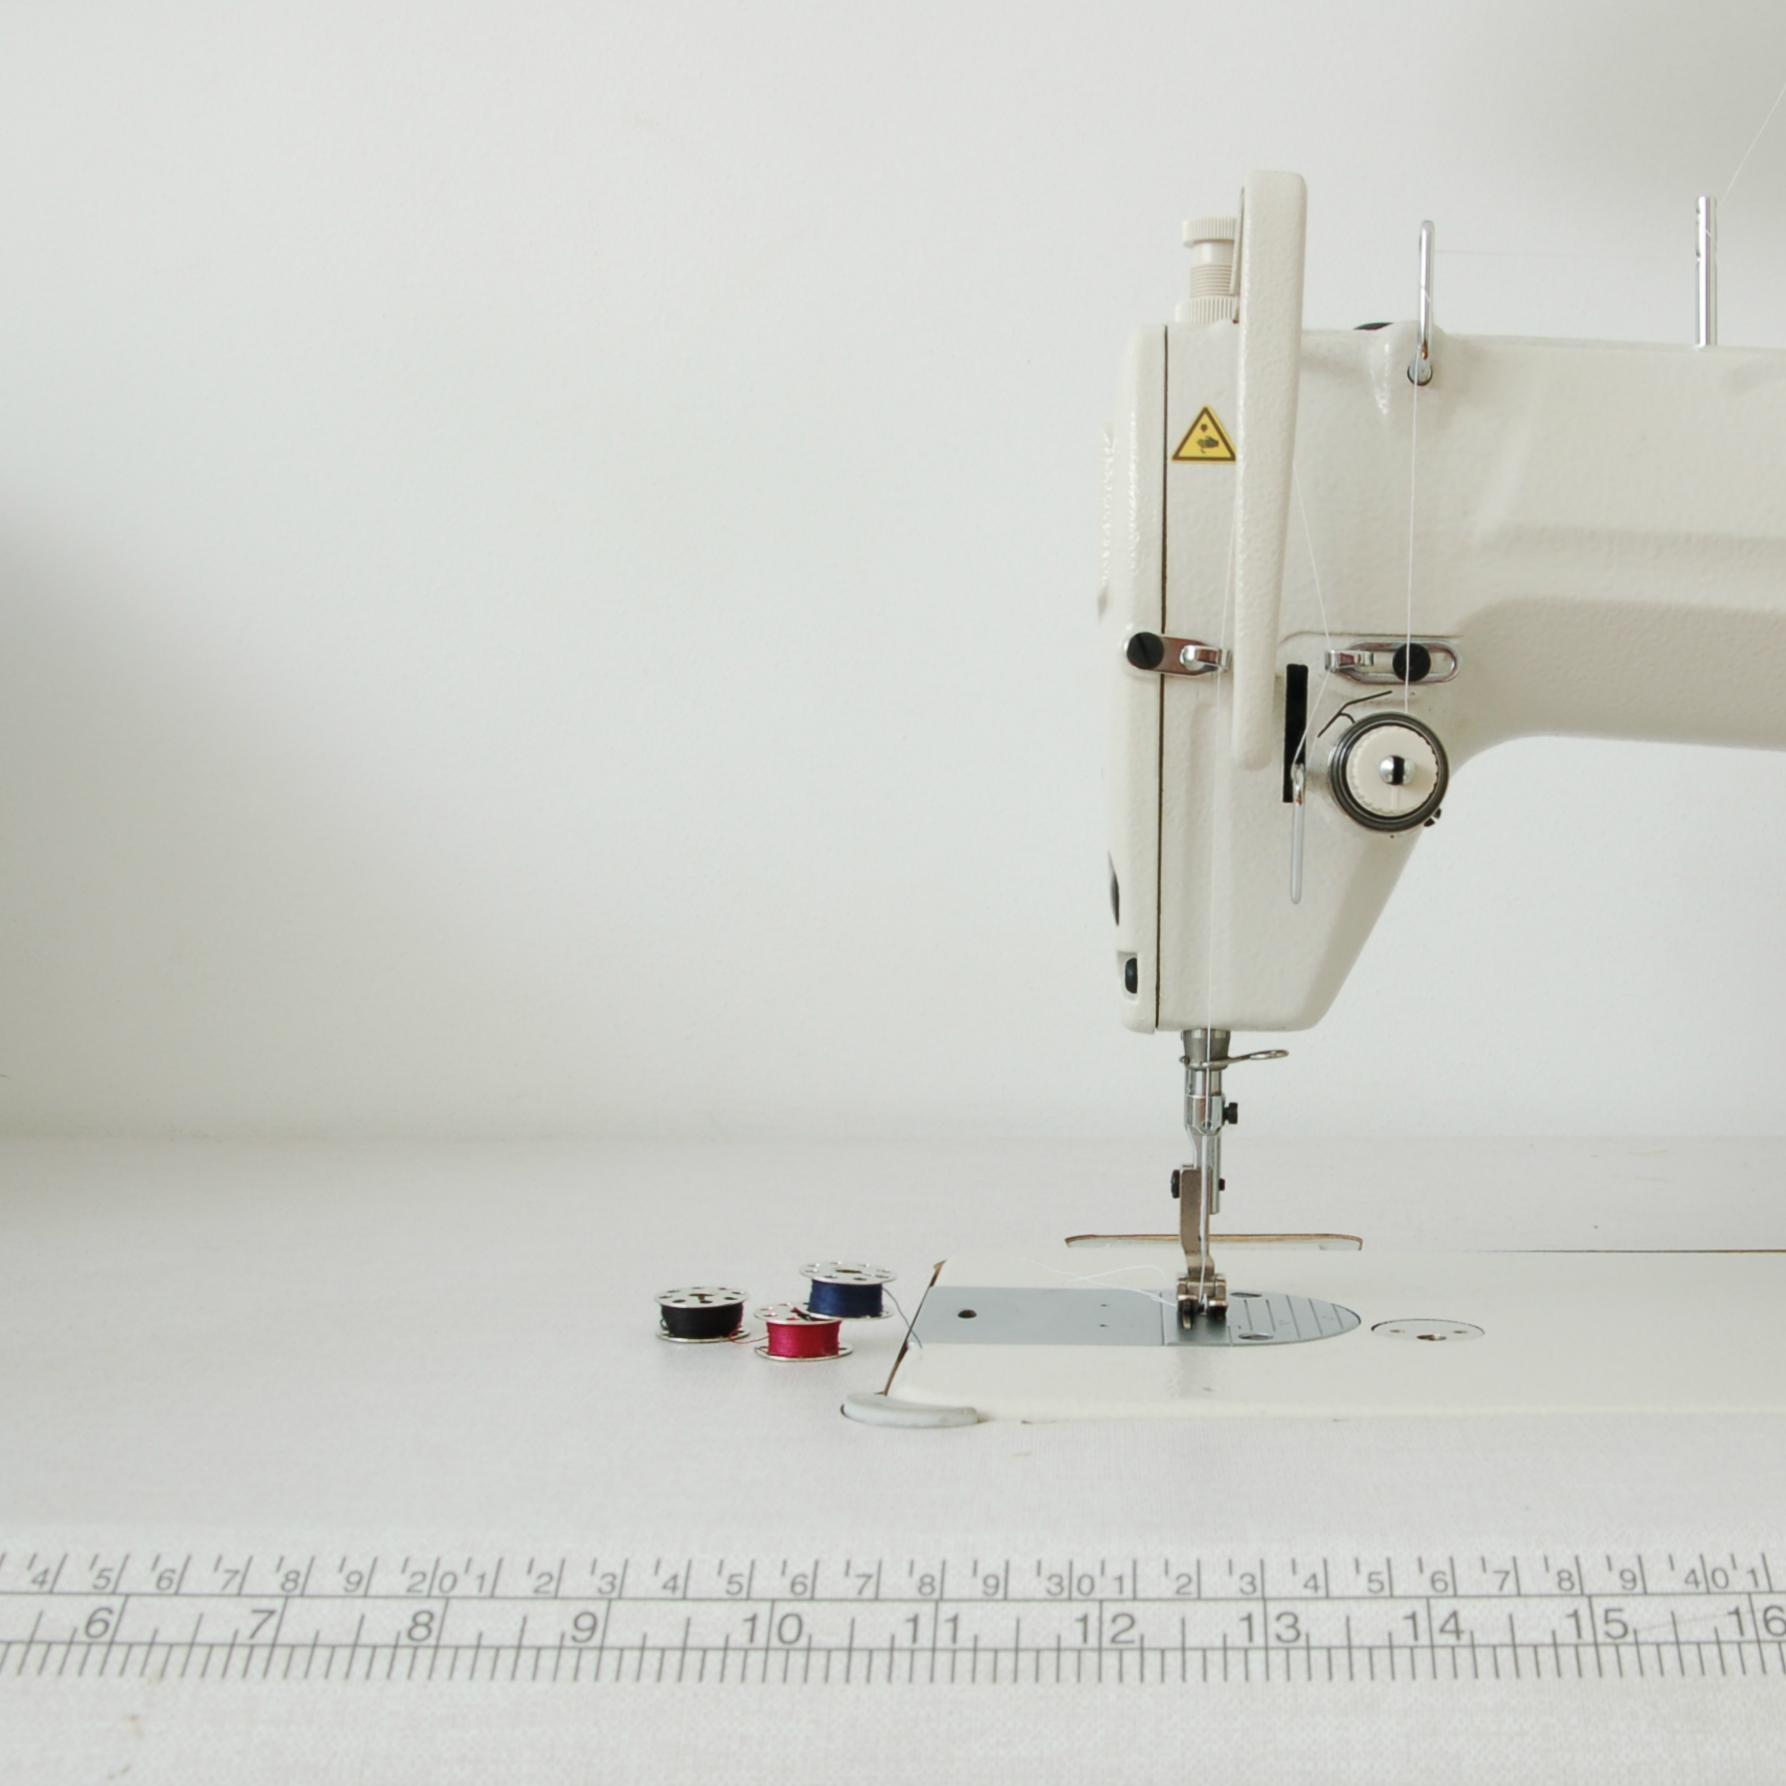 www.studiocostura.com